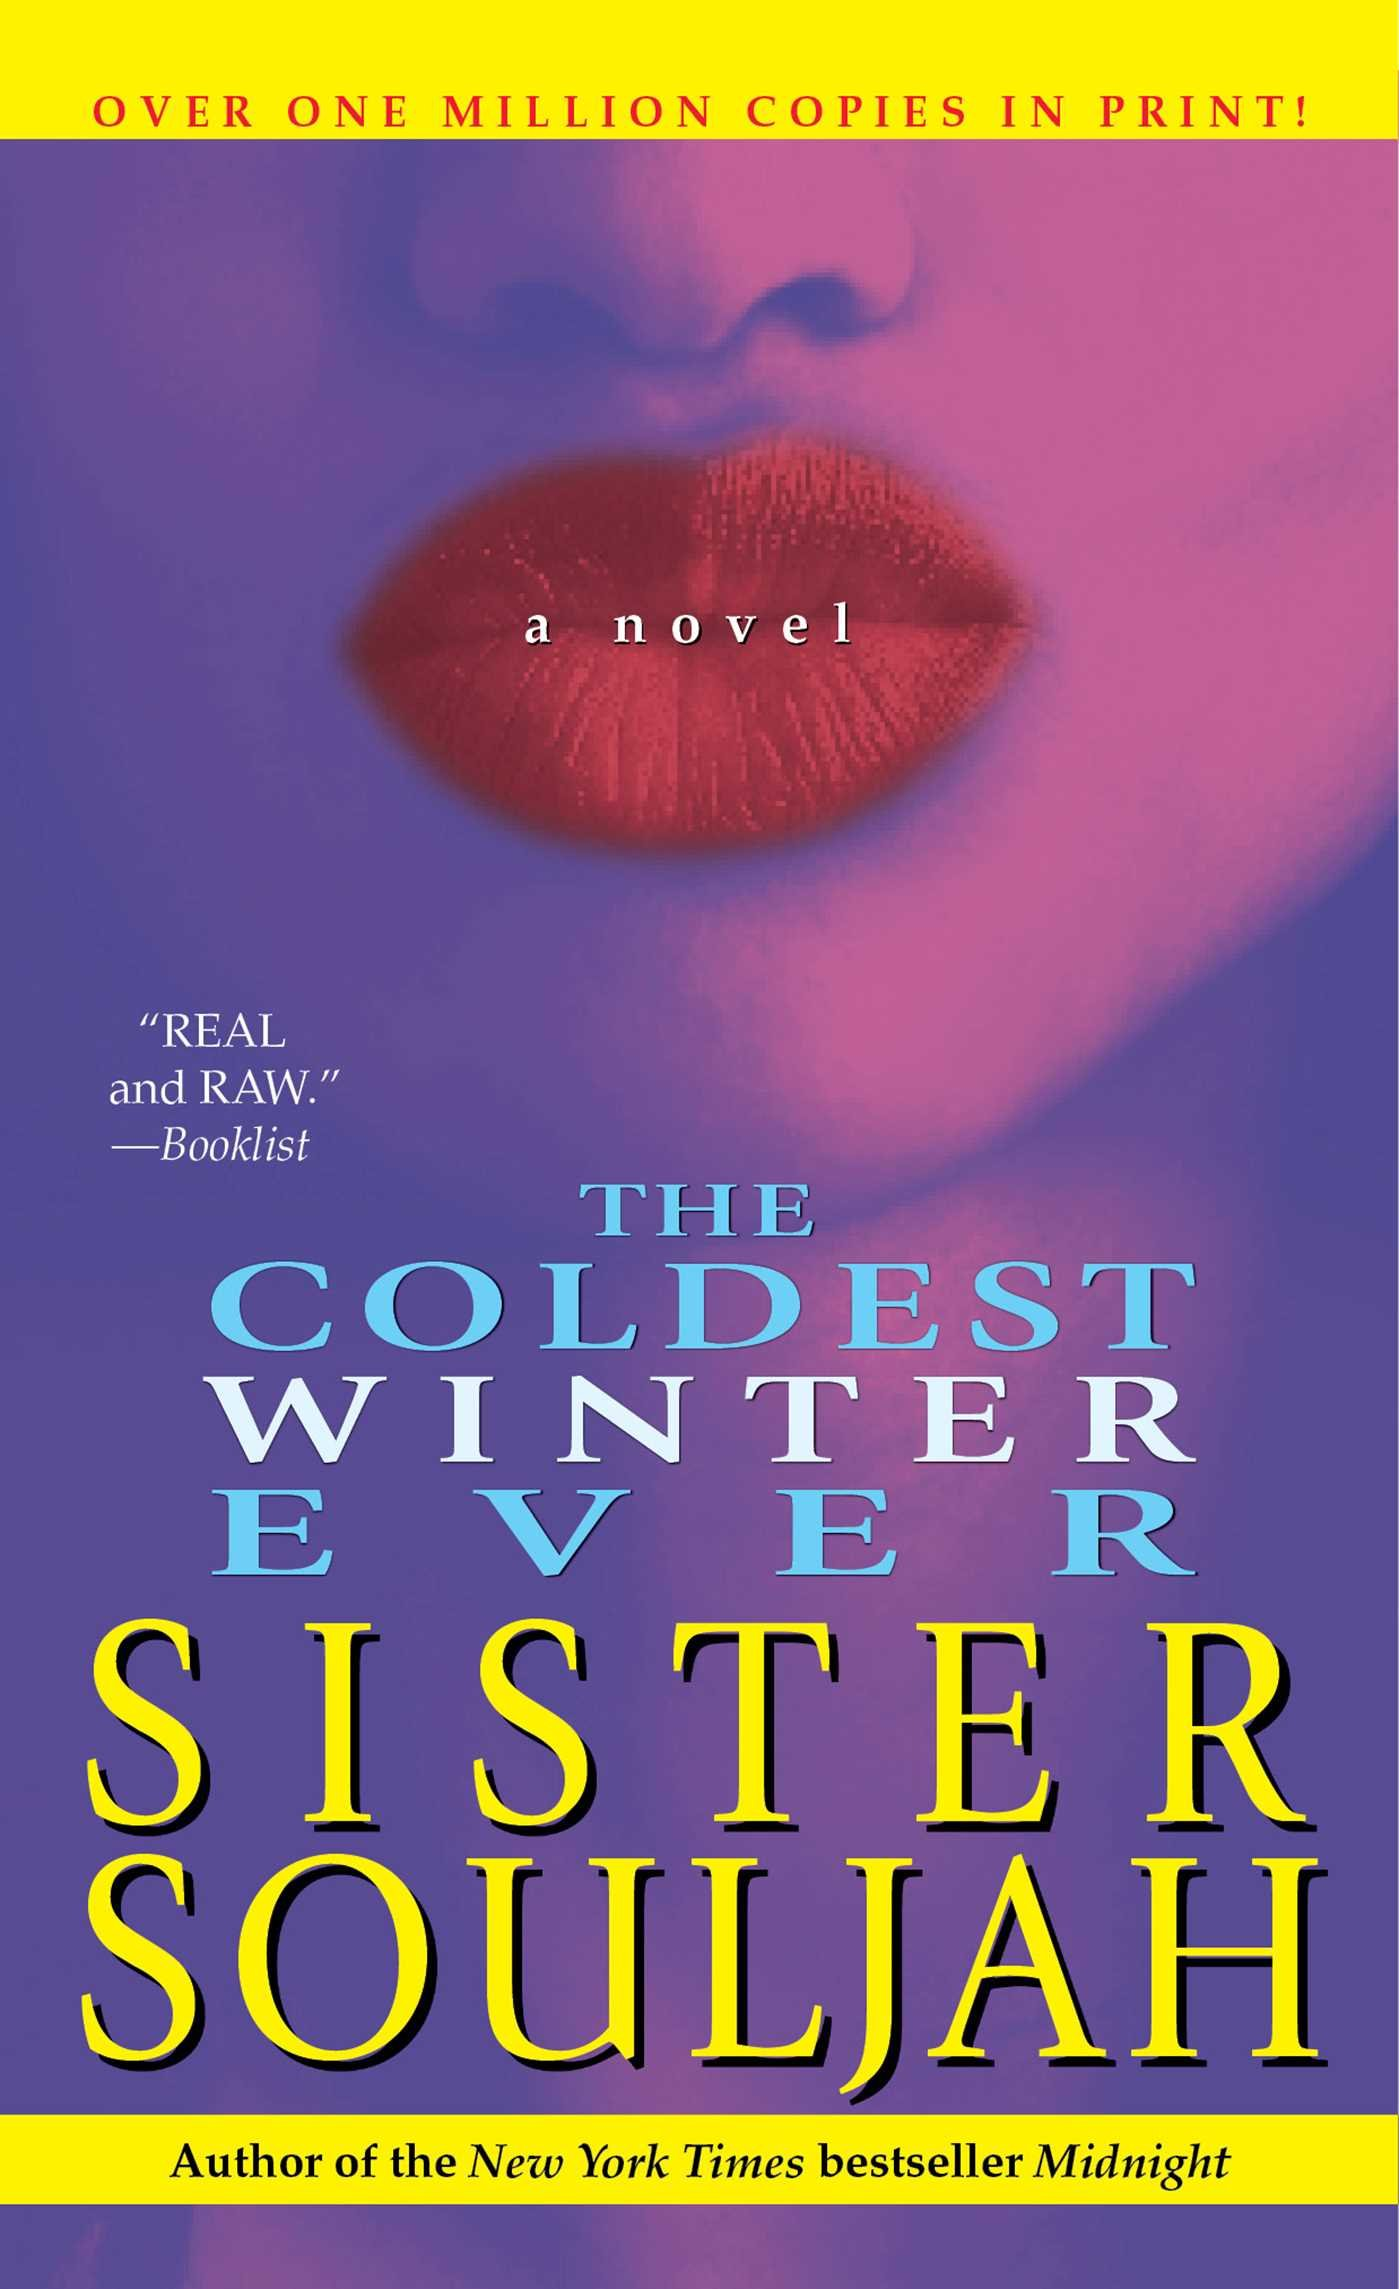 Amazon.com: The Coldest Winter Ever (9781416521693): Sister Souljah: Books